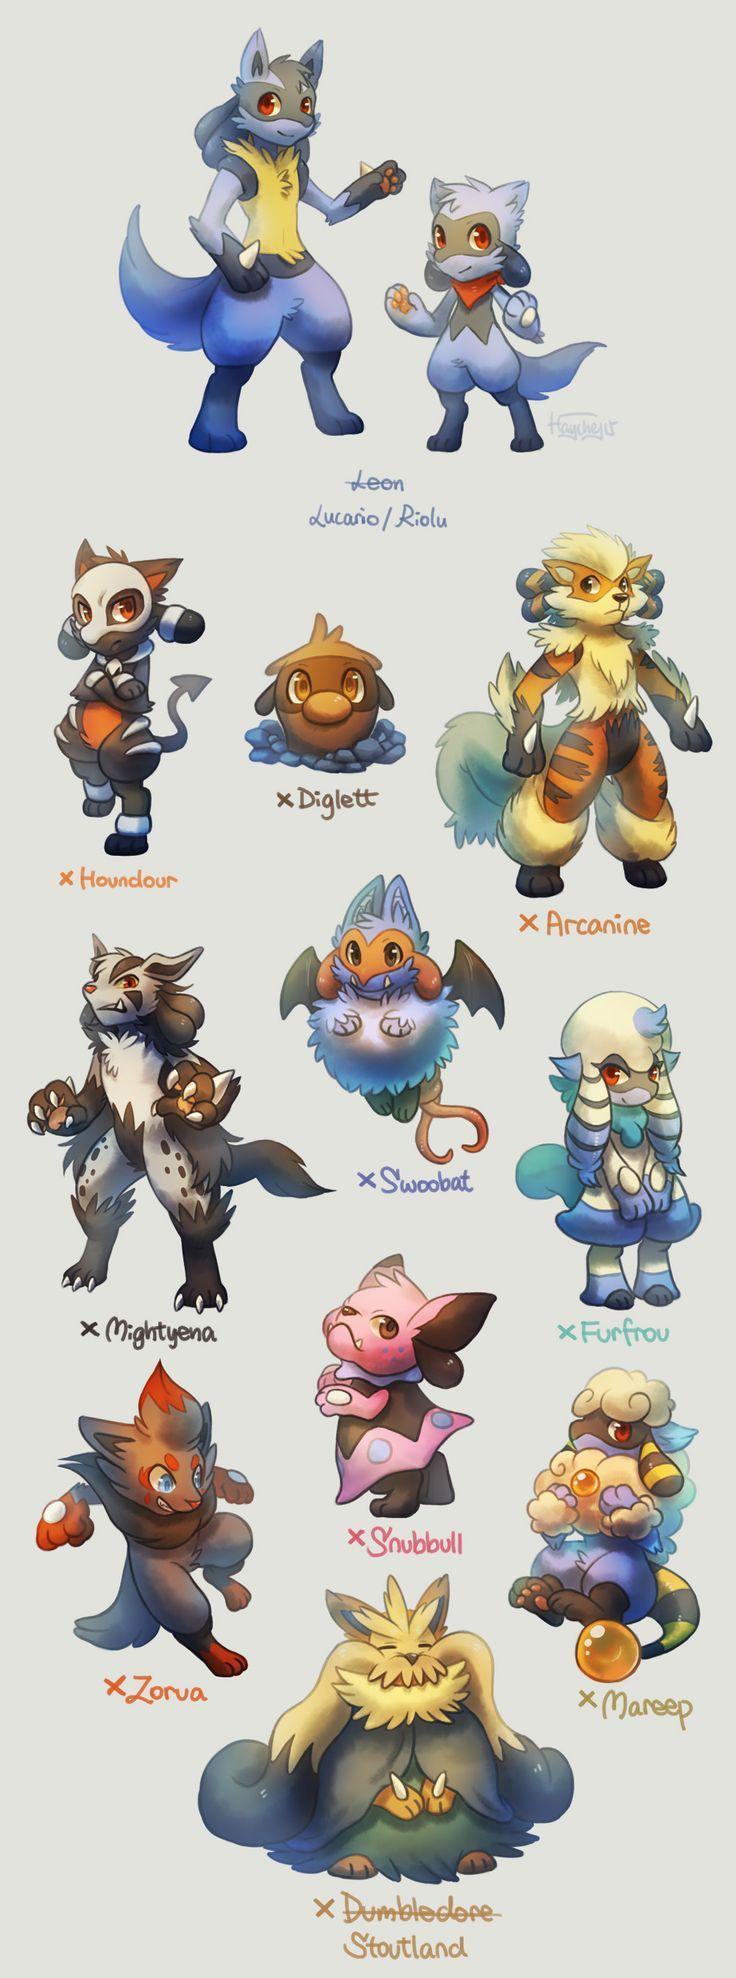 Squishy Pokemon Anime : Pin de Squishy Sam en pokemon Pinterest Anime fan art, Fusion pokemon y Lugares magicos